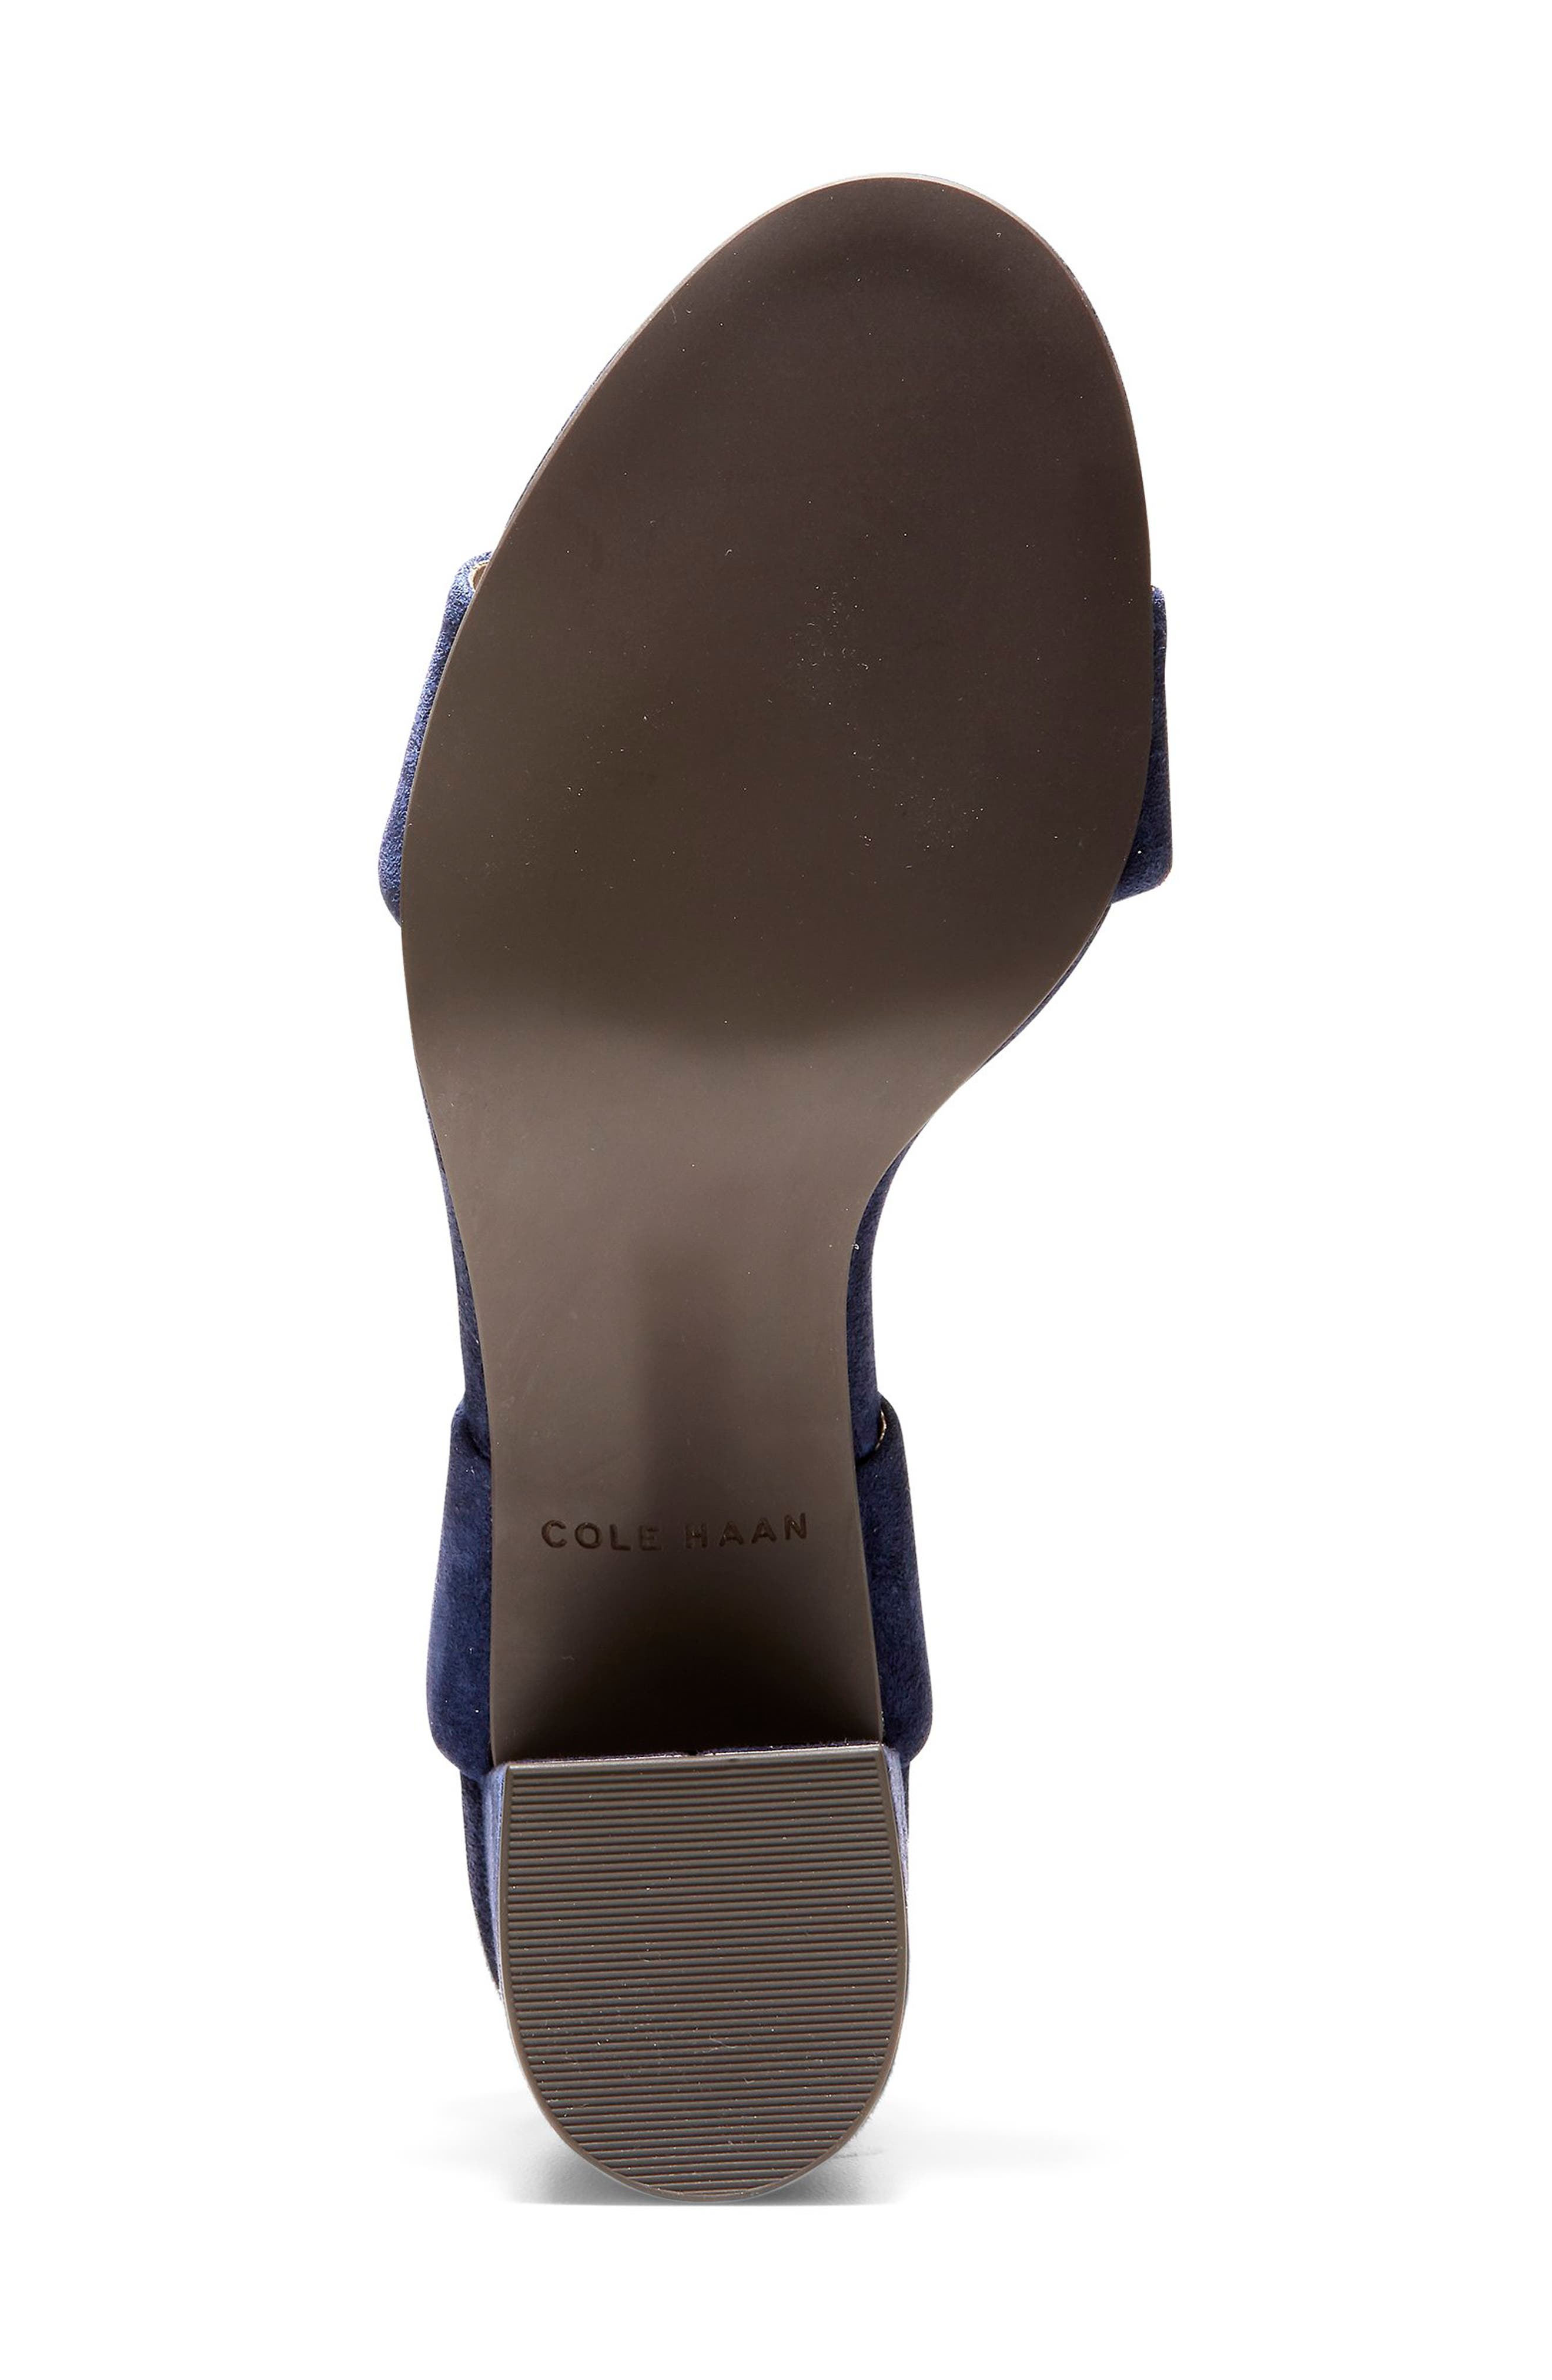 COLE HAAN, Avani Block Heel Sandal, Alternate thumbnail 5, color, MARINE BLUE SUEDE